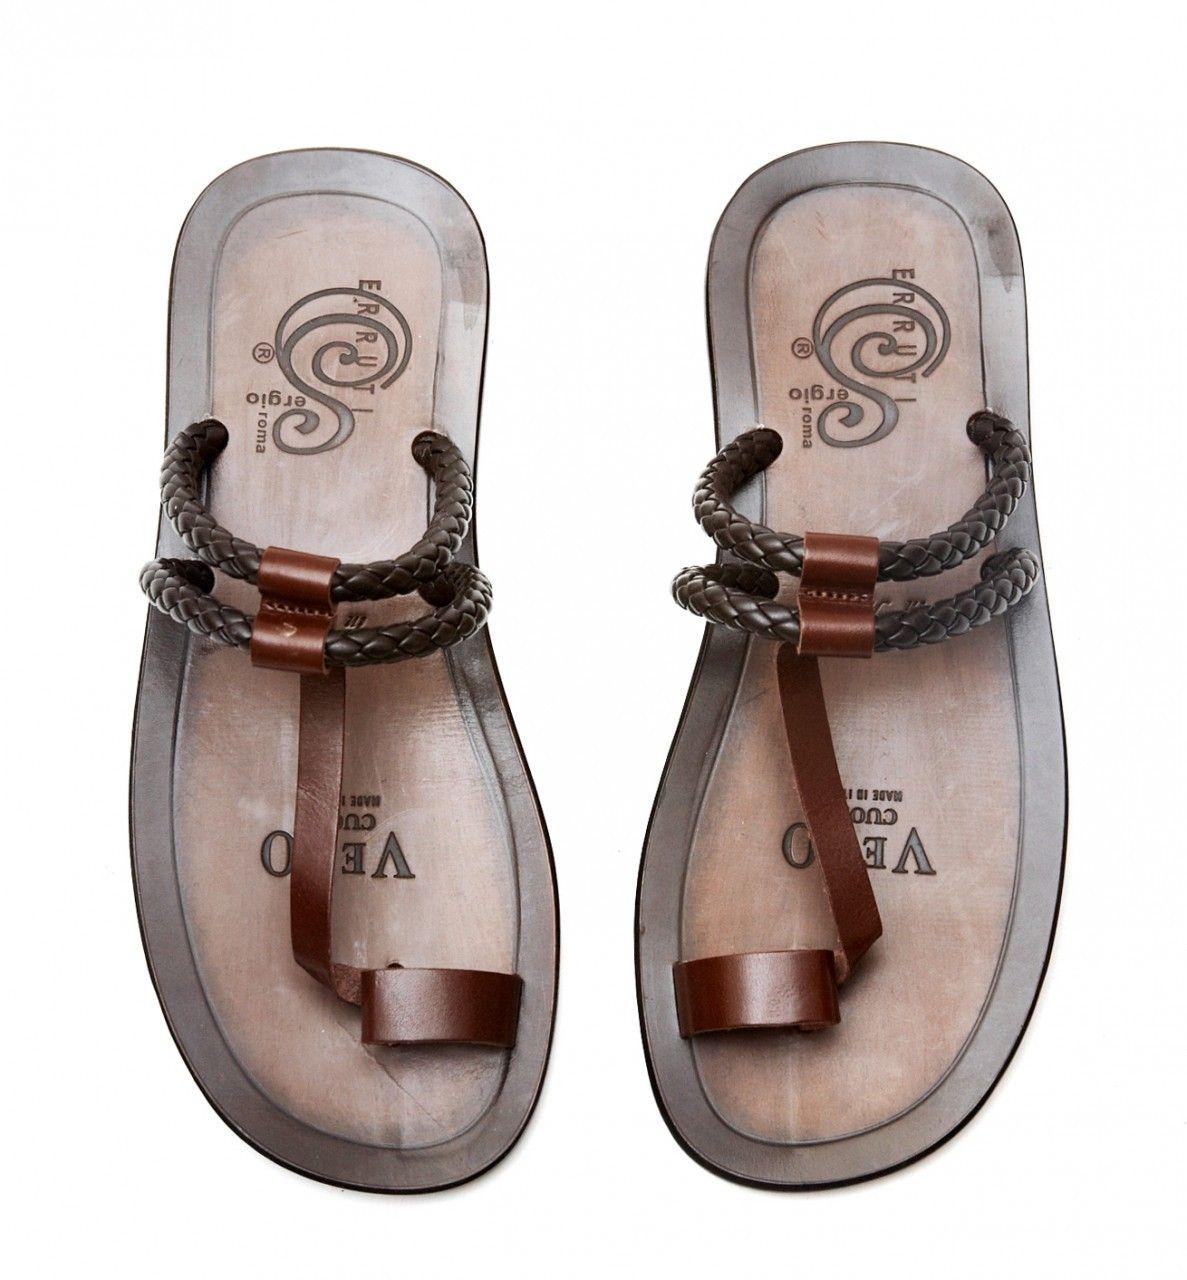 06d472f8869 Zaffaella Shoes - Primo Brown Italian Mens Casual Leather Sandals ...